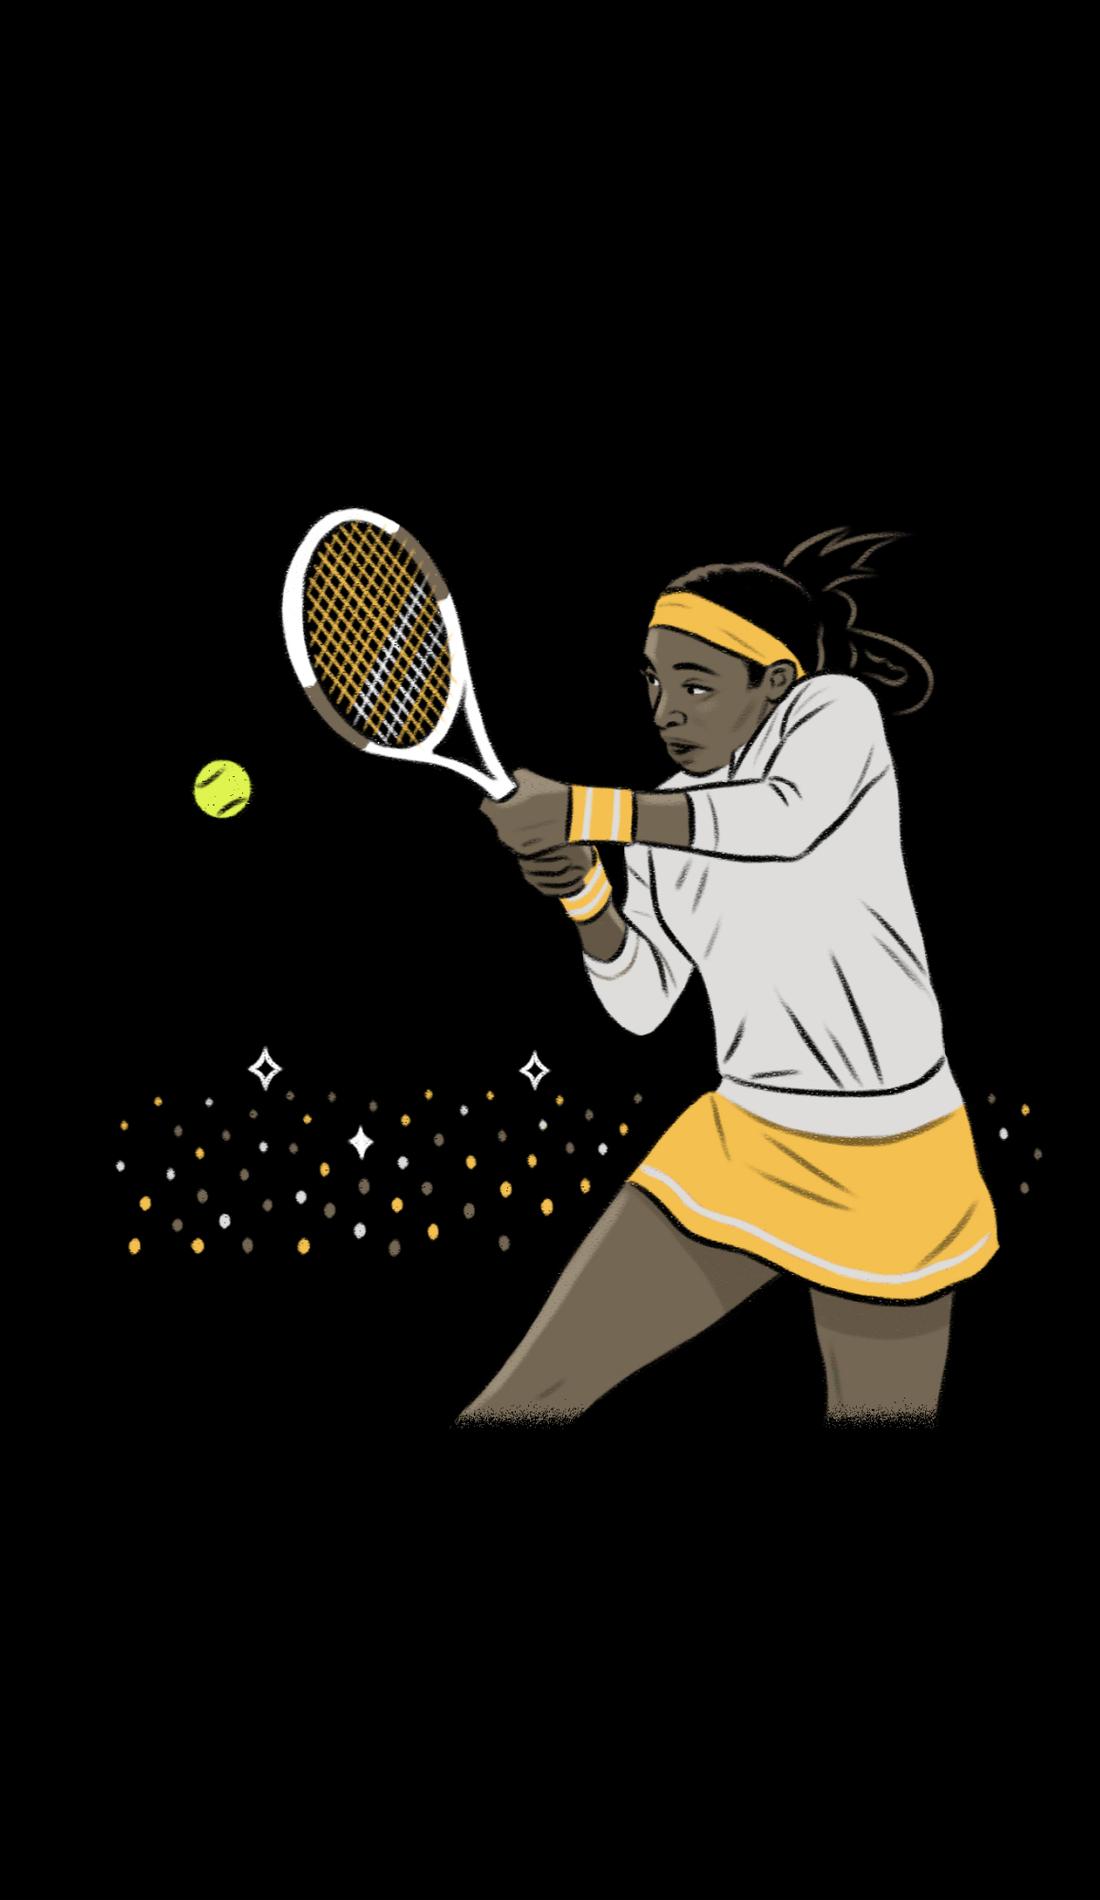 A Texas Tennis Open live event